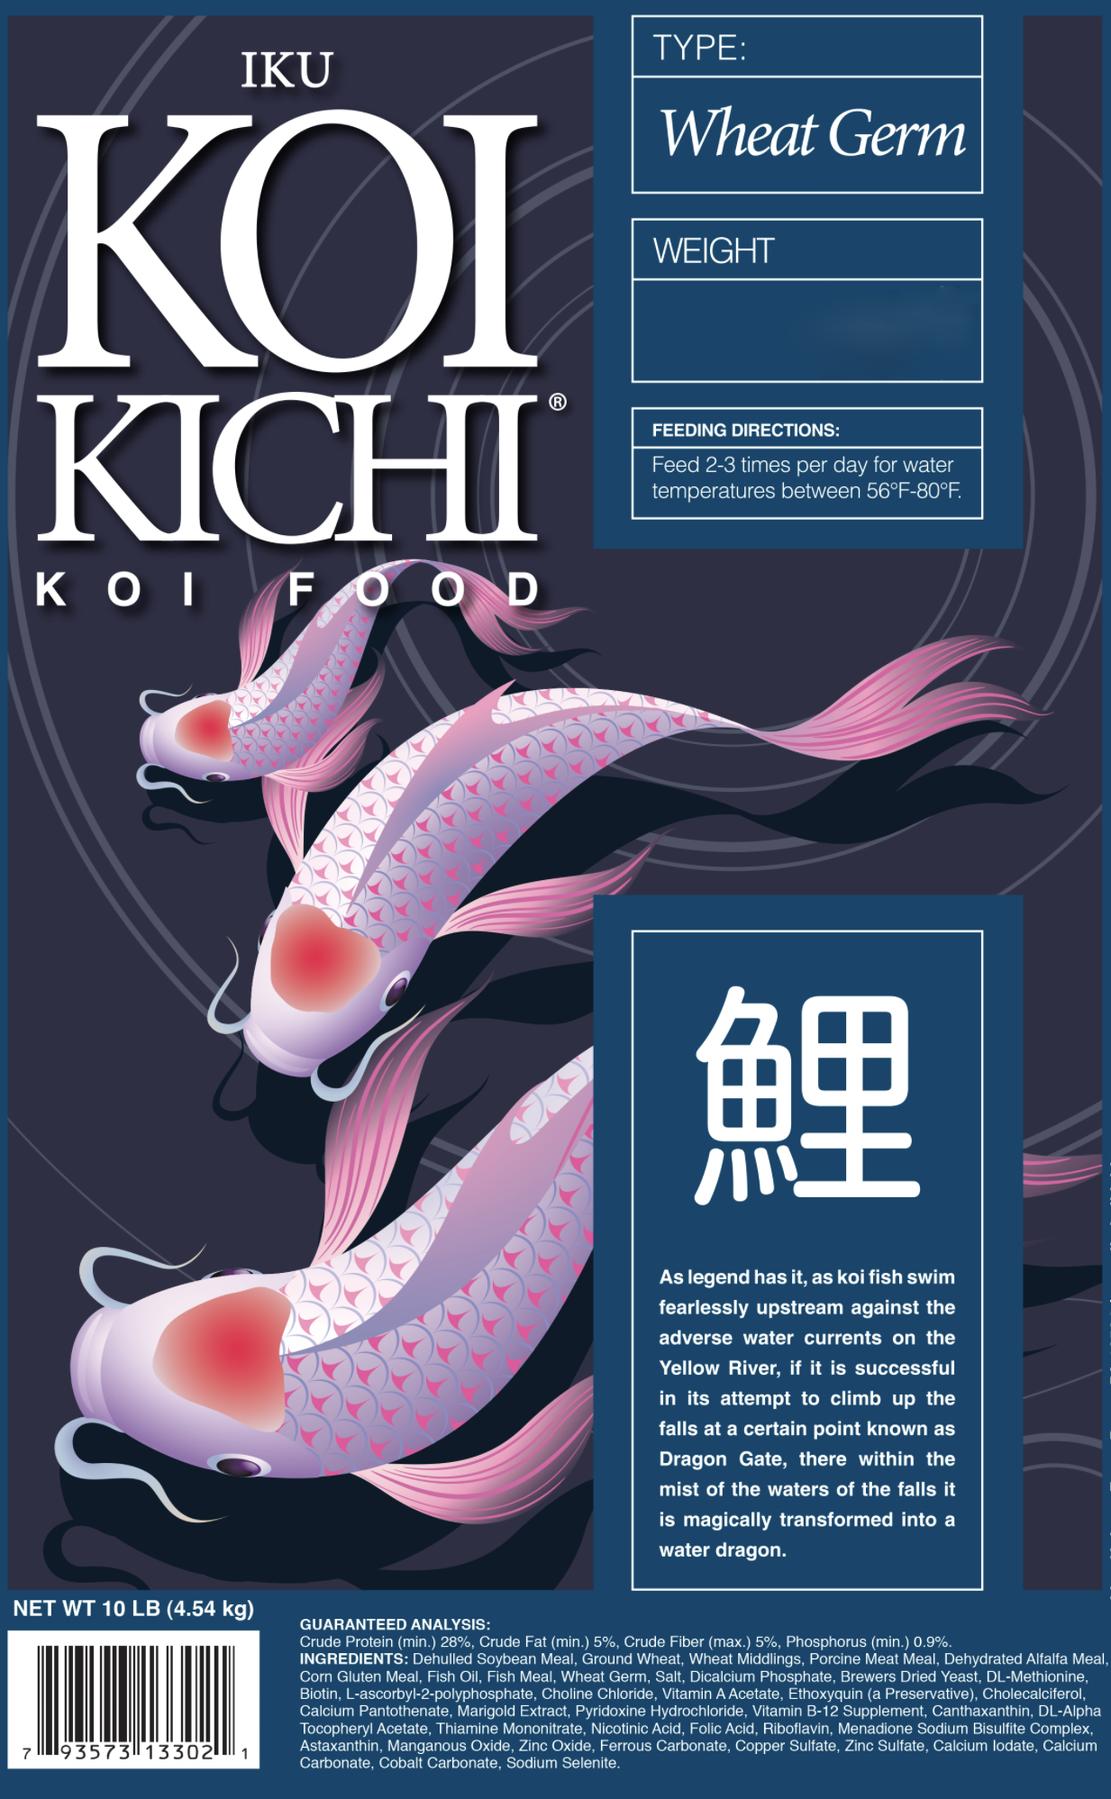 Iku Koi Kichi Wheat Germ Koi Fish Food - 10 lbs.